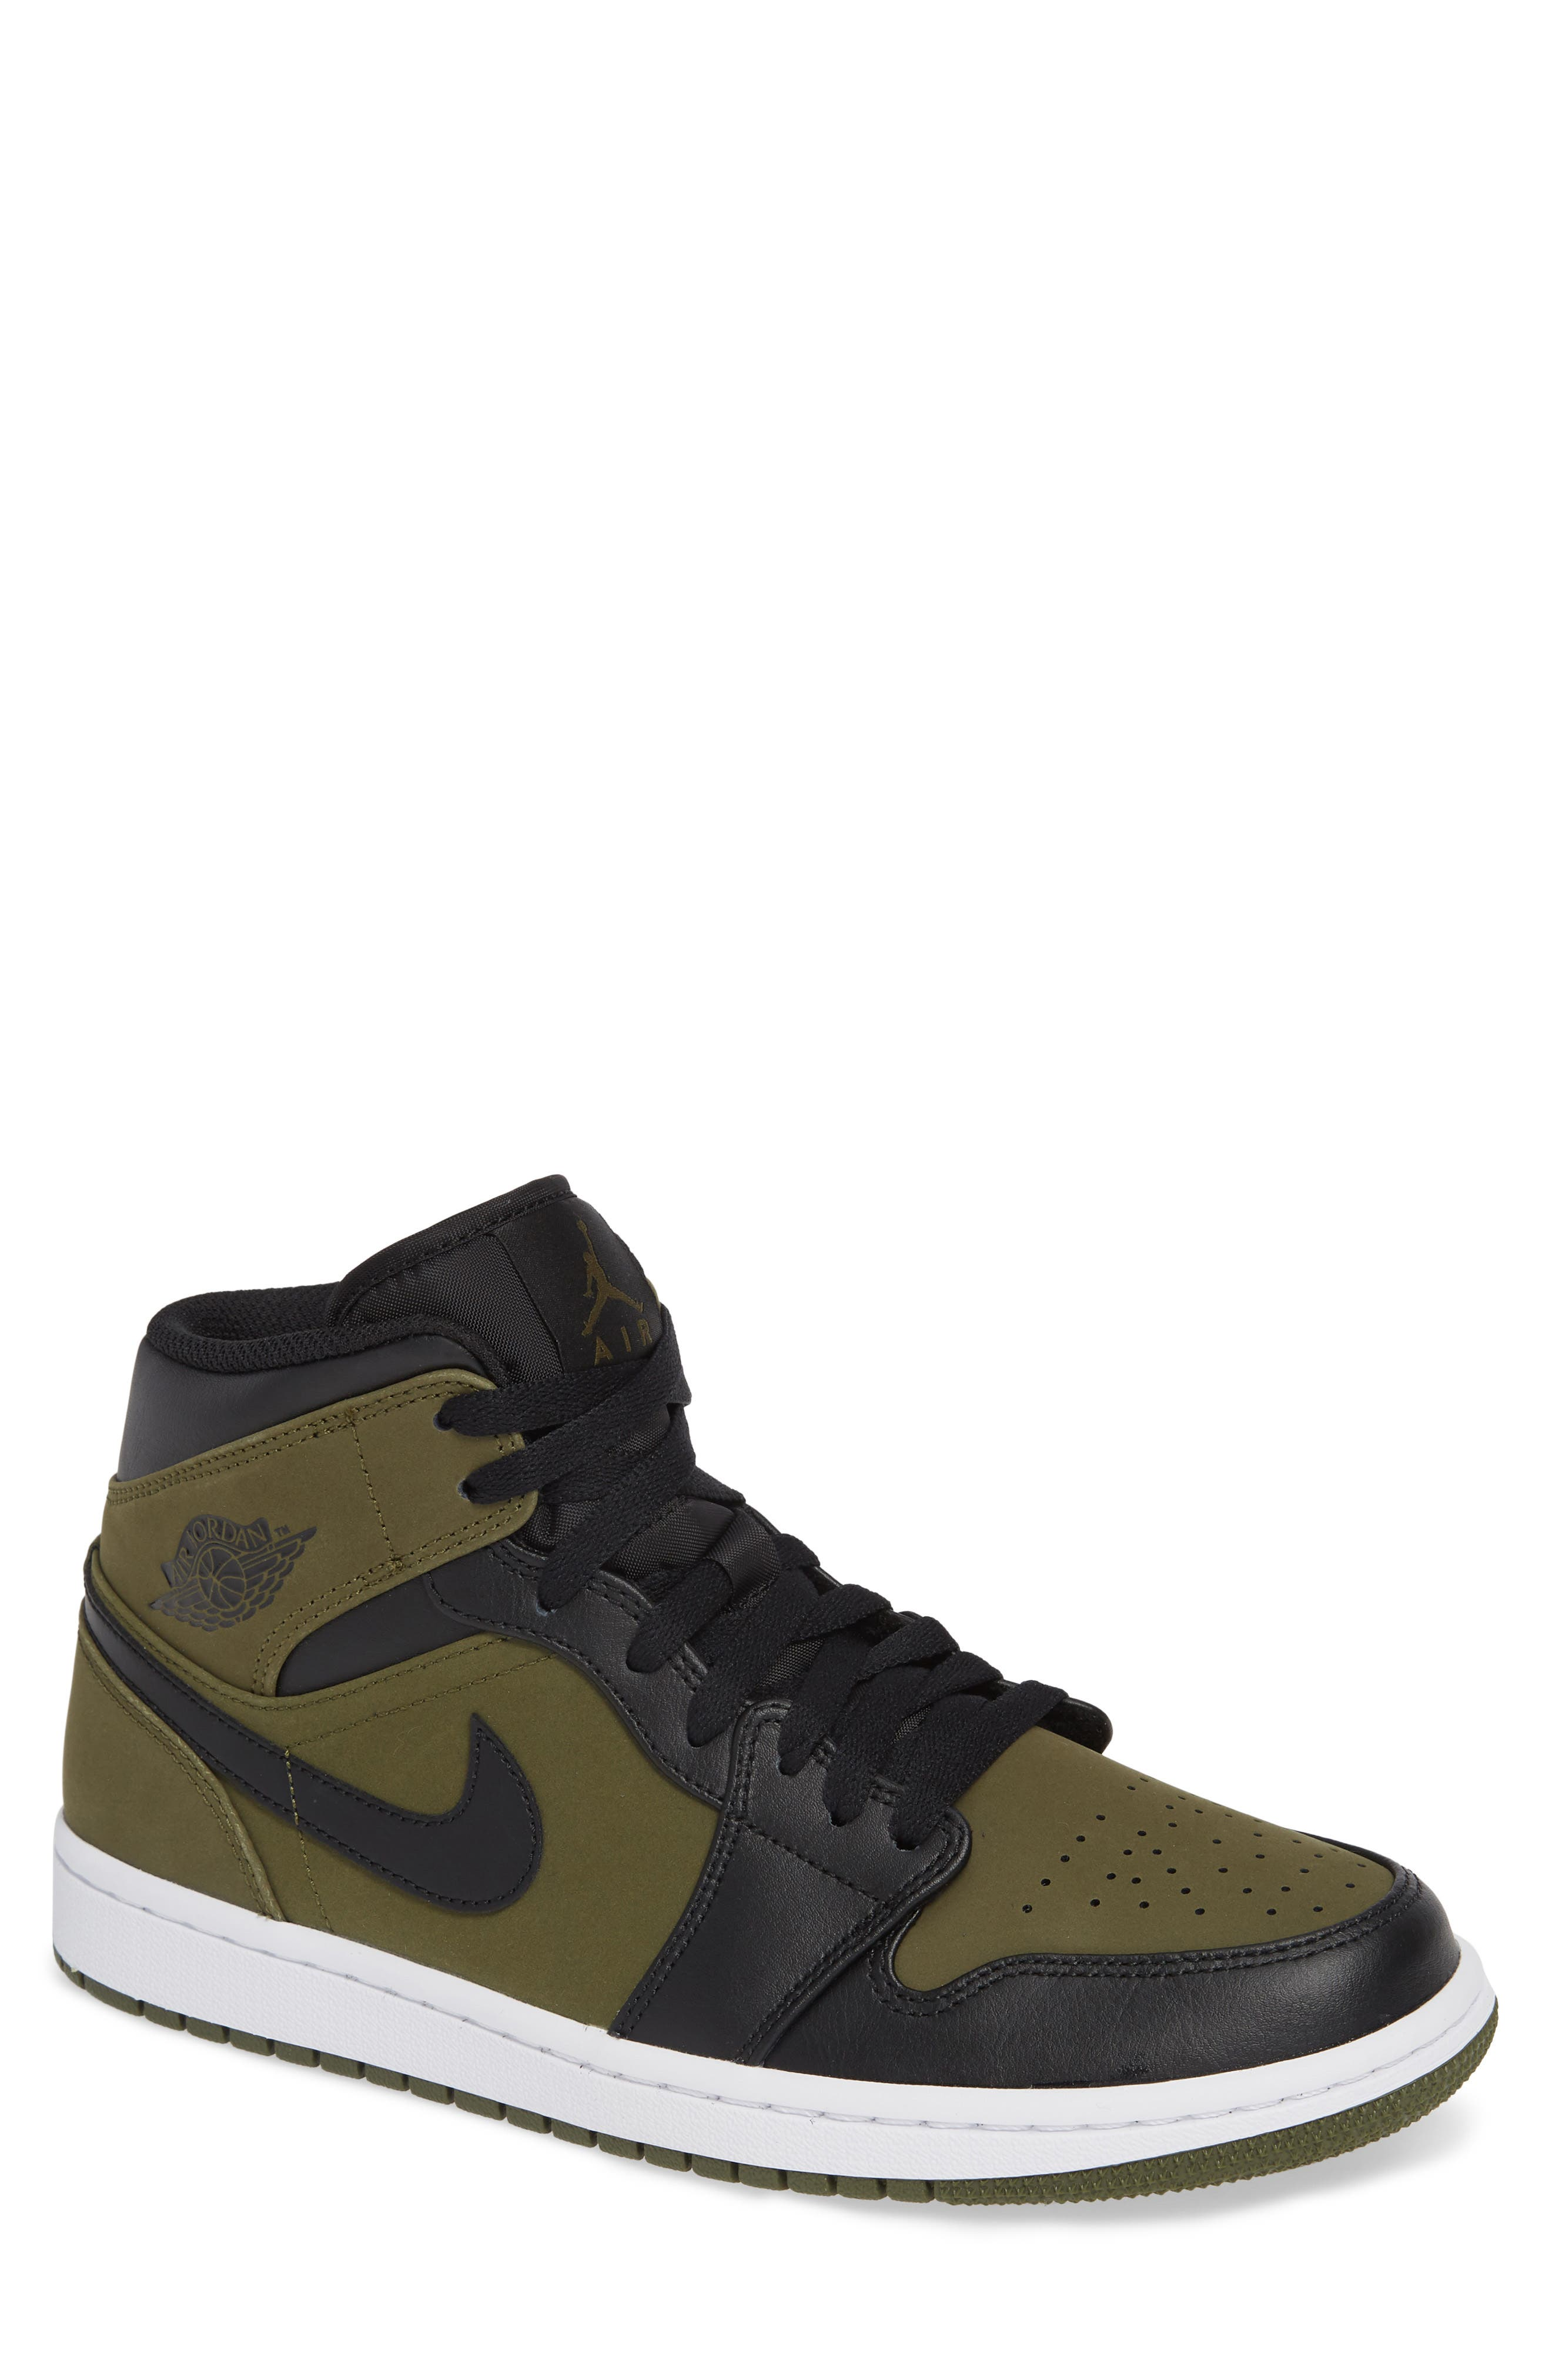 'Air Jordan 1 Mid' Sneaker,                         Main,                         color, OLIVE CANVAS/ BLACK/ WHITE